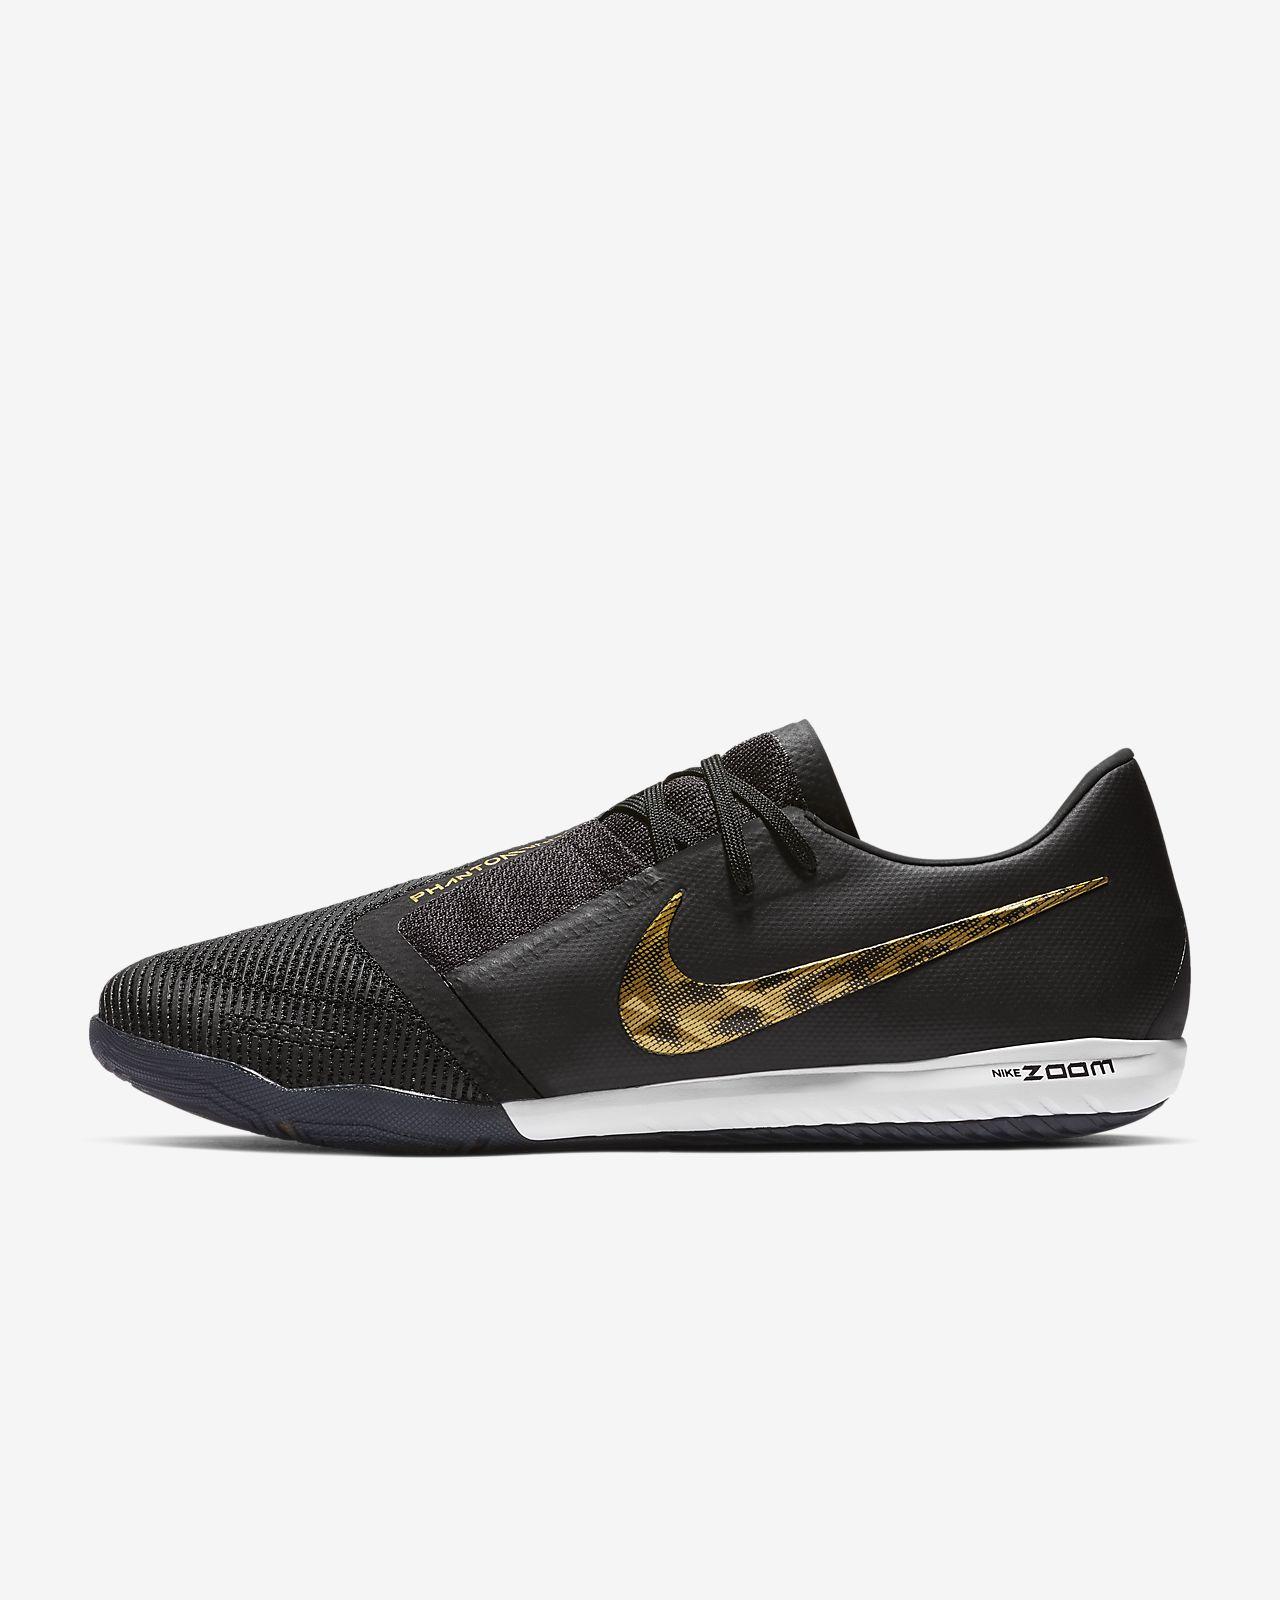 wholesale dealer e3847 07741 Halowe buty piłkarskie Nike Zoom Phantom Venom Pro IC